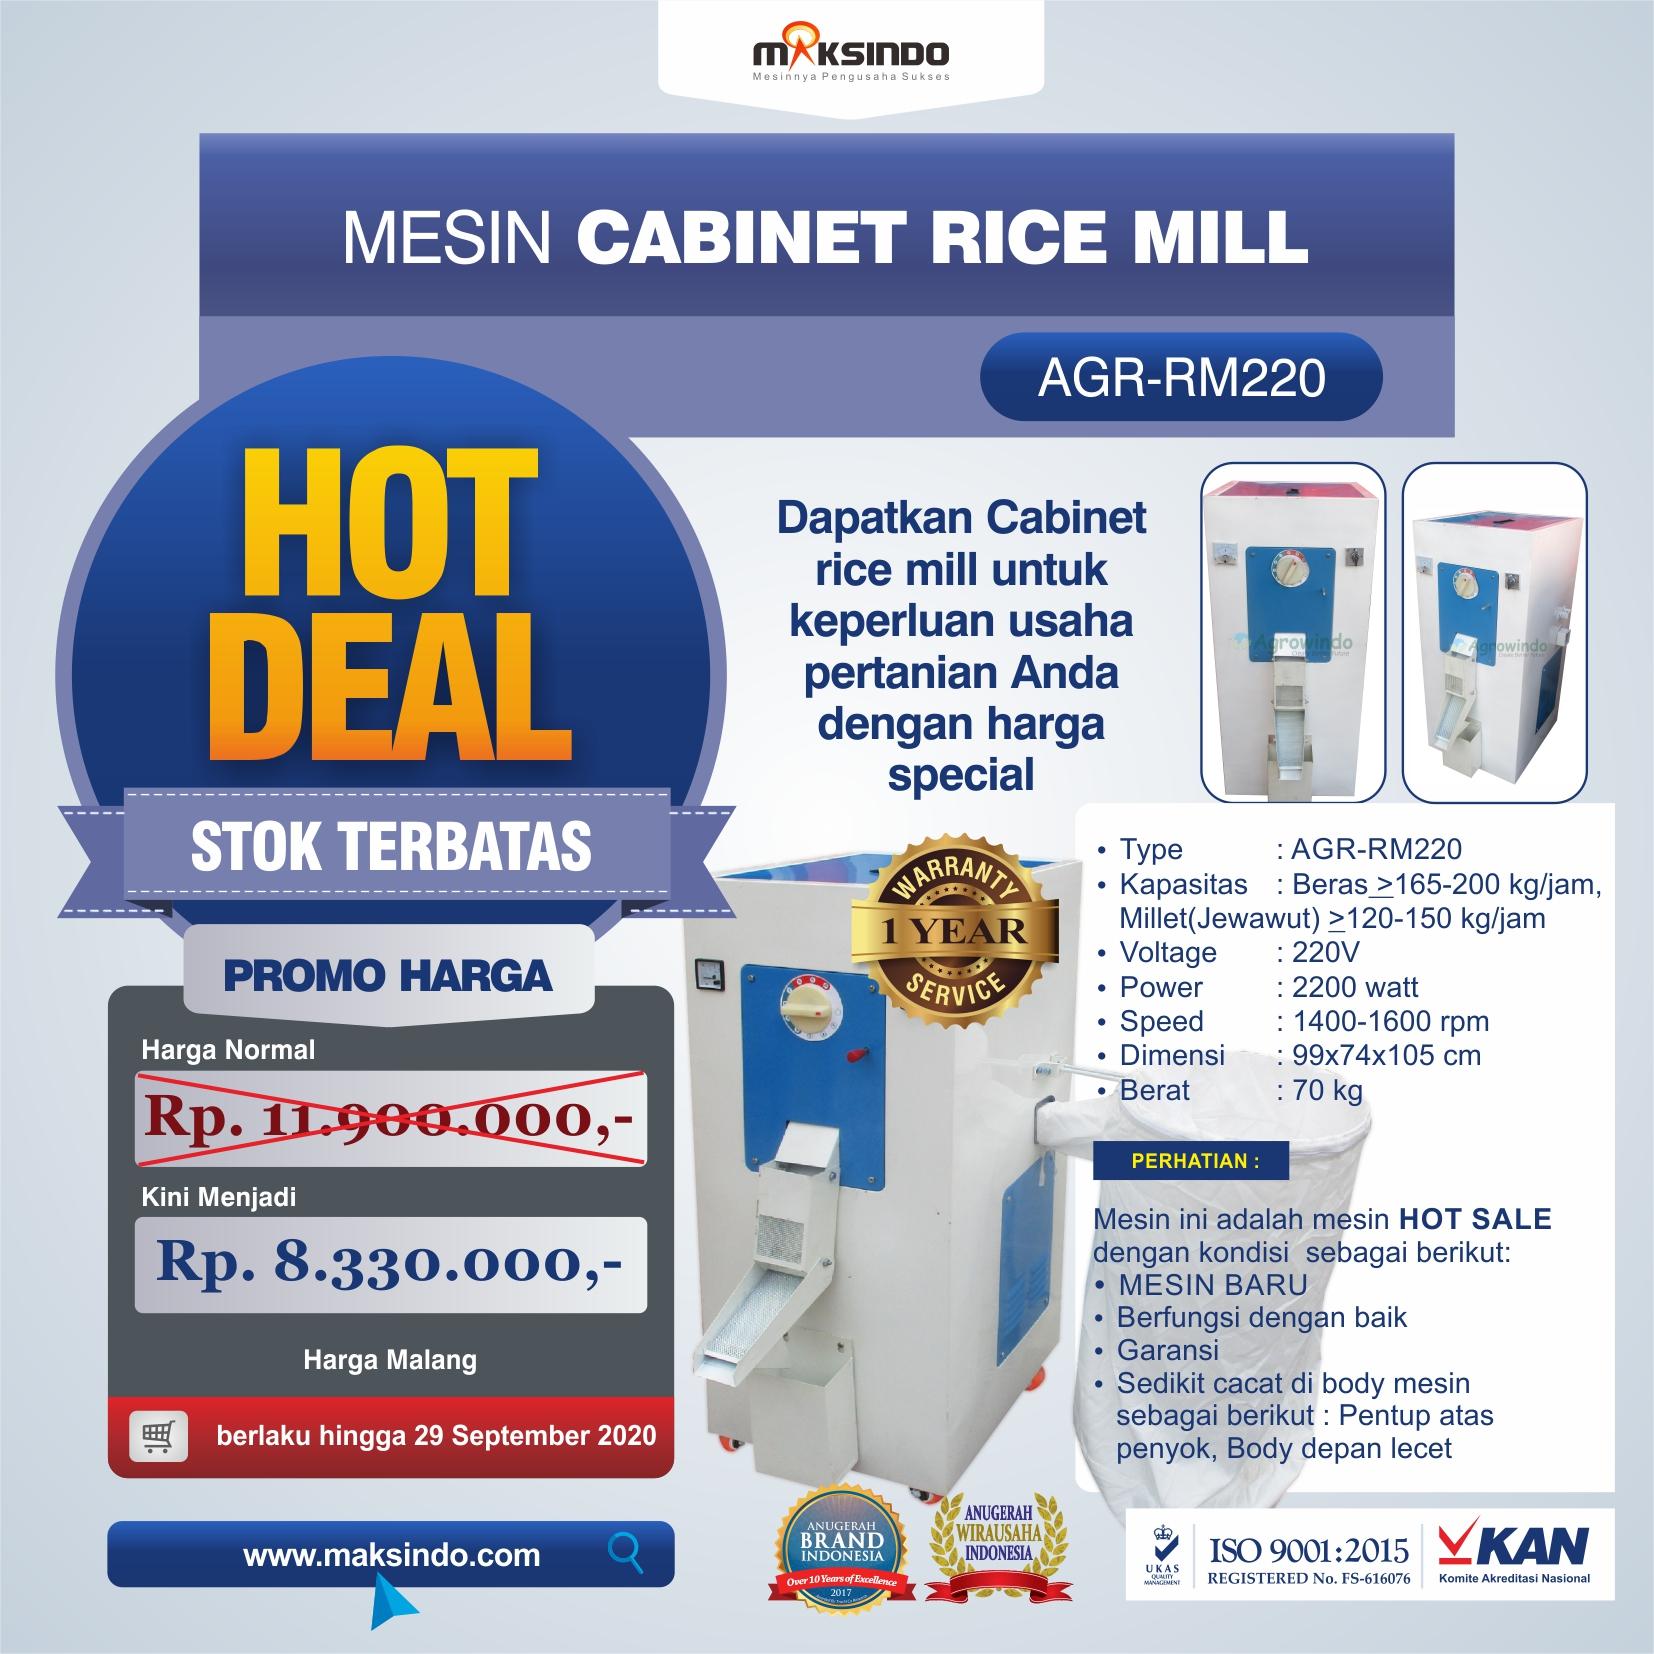 Jual Mesin Cabinet Rice Mill AGR-RM220 di Mataram